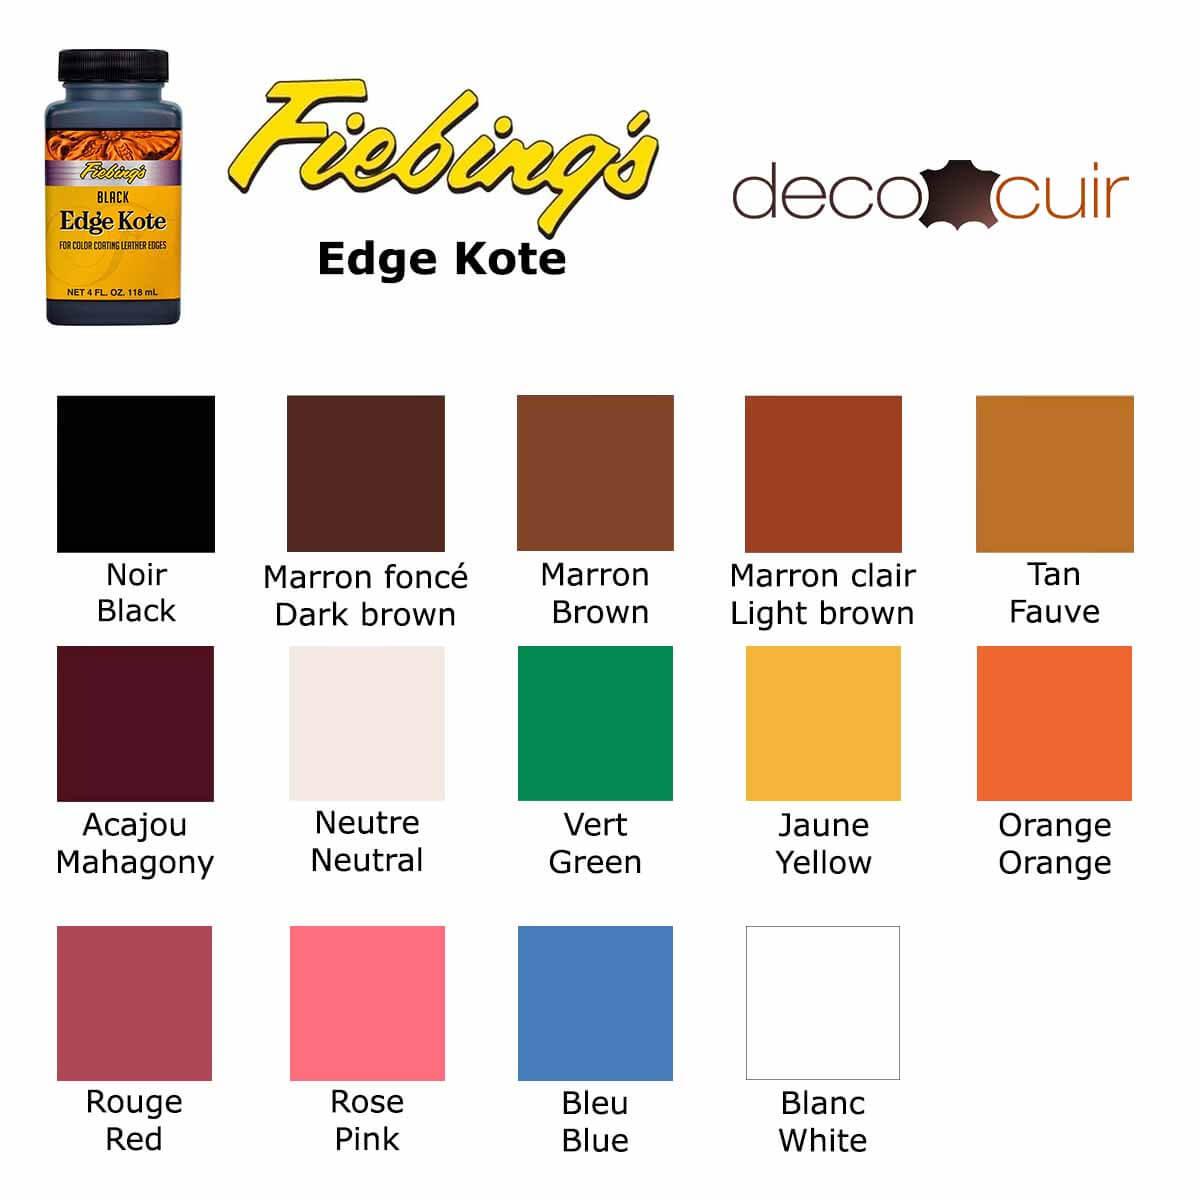 Finition de tranche pour cuir - Fiebing's edge kote - 118ml